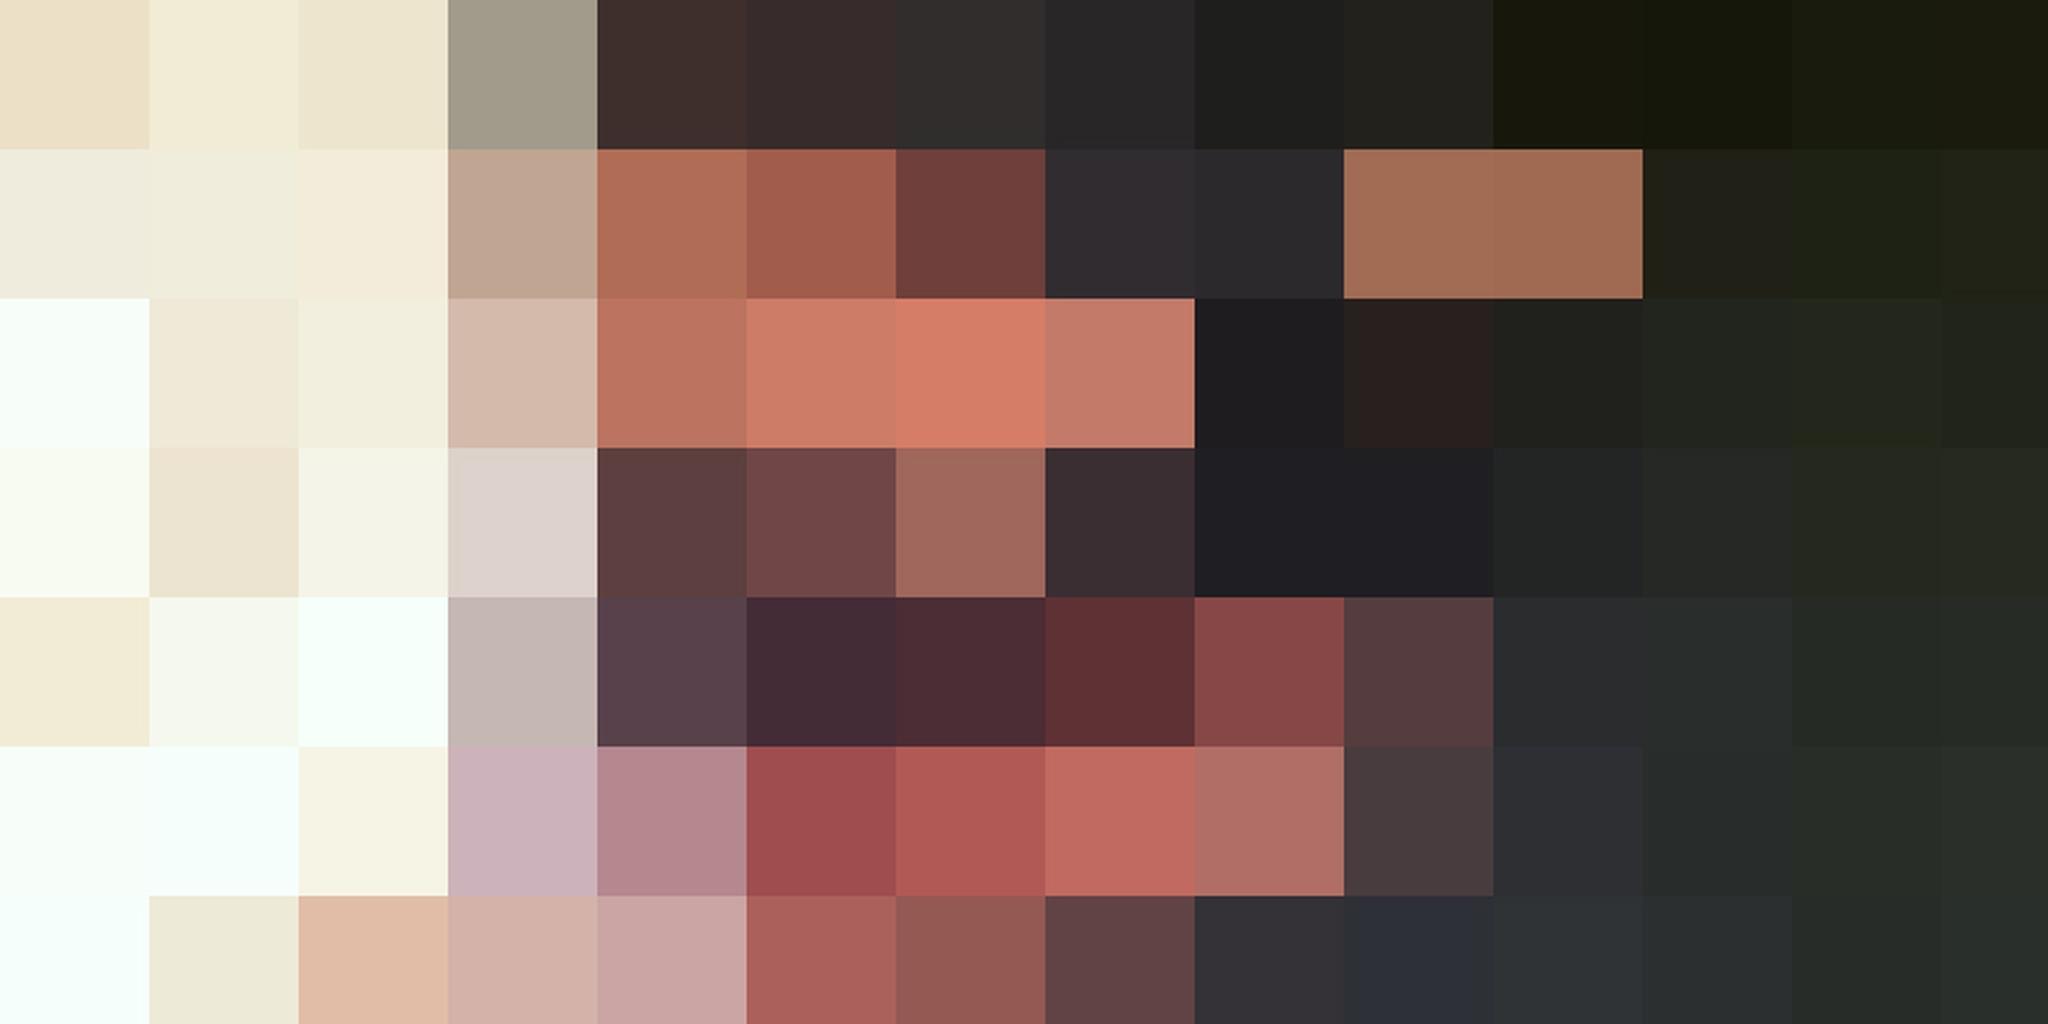 Blurry 4chan image